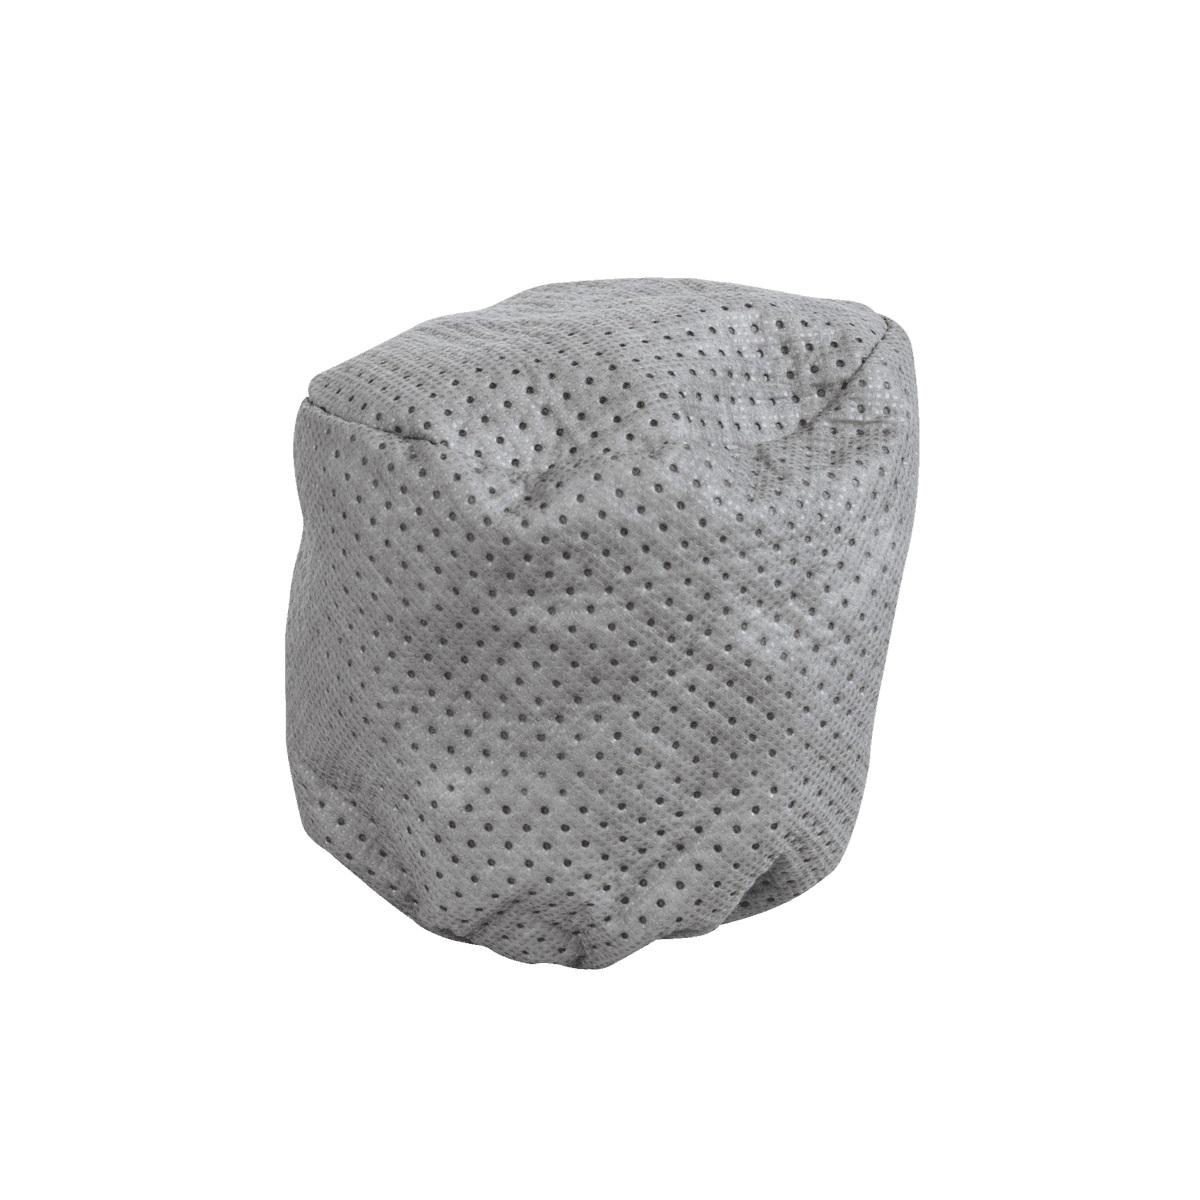 Scheppach Látkový filtr pratelný (sada 2 ks) pro ASP 15-ES, ASP 20-ES, ASP 30-ES